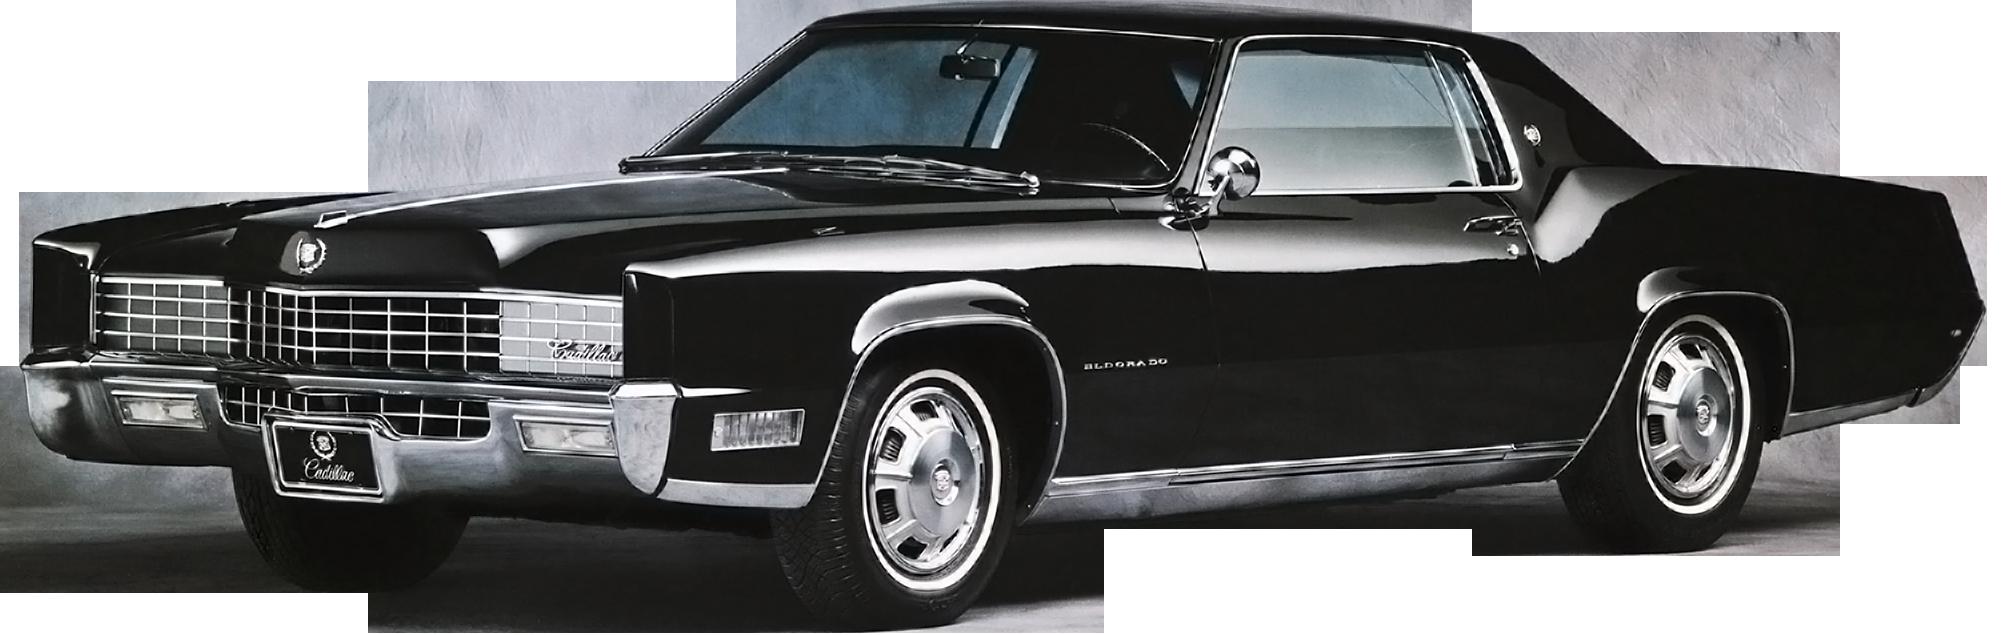 Cadilac car clipart vector free download Cadillac PNG Image - PurePNG | Free transparent CC0 PNG Image Library vector free download